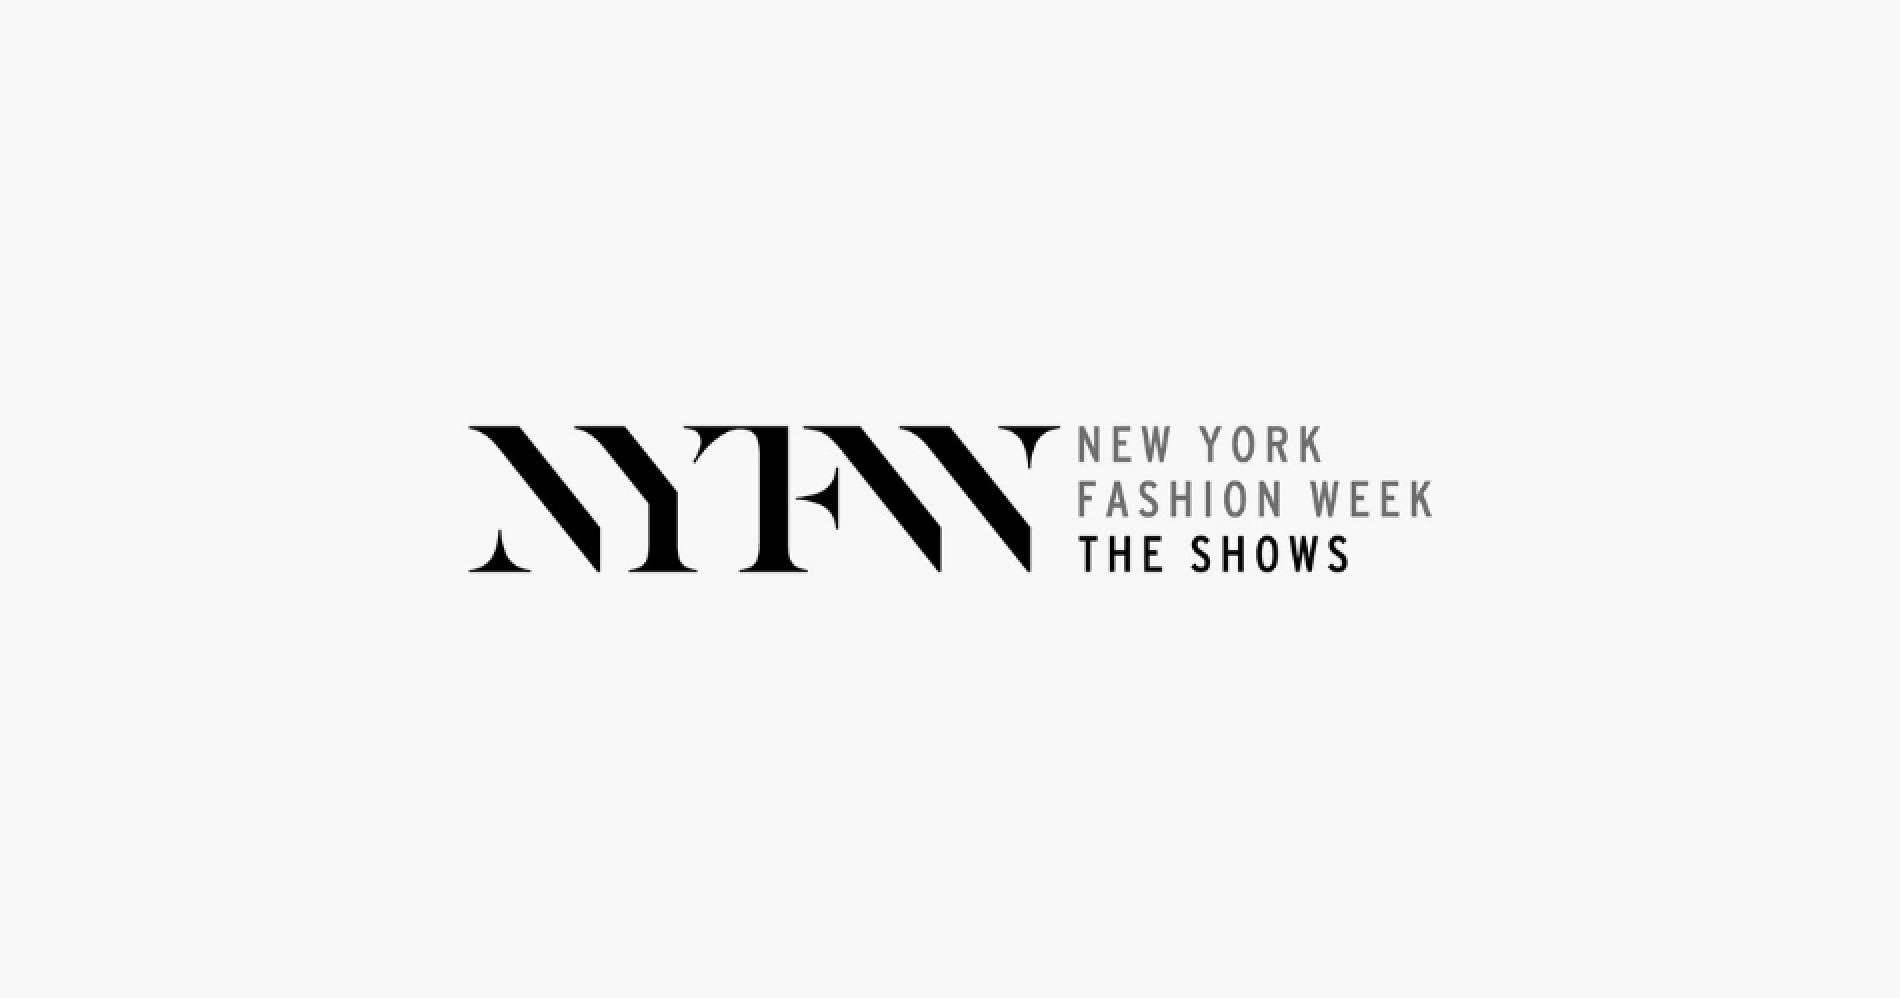 New York Fashion Week Logo Illustration Web Bisnis Muda - Canva